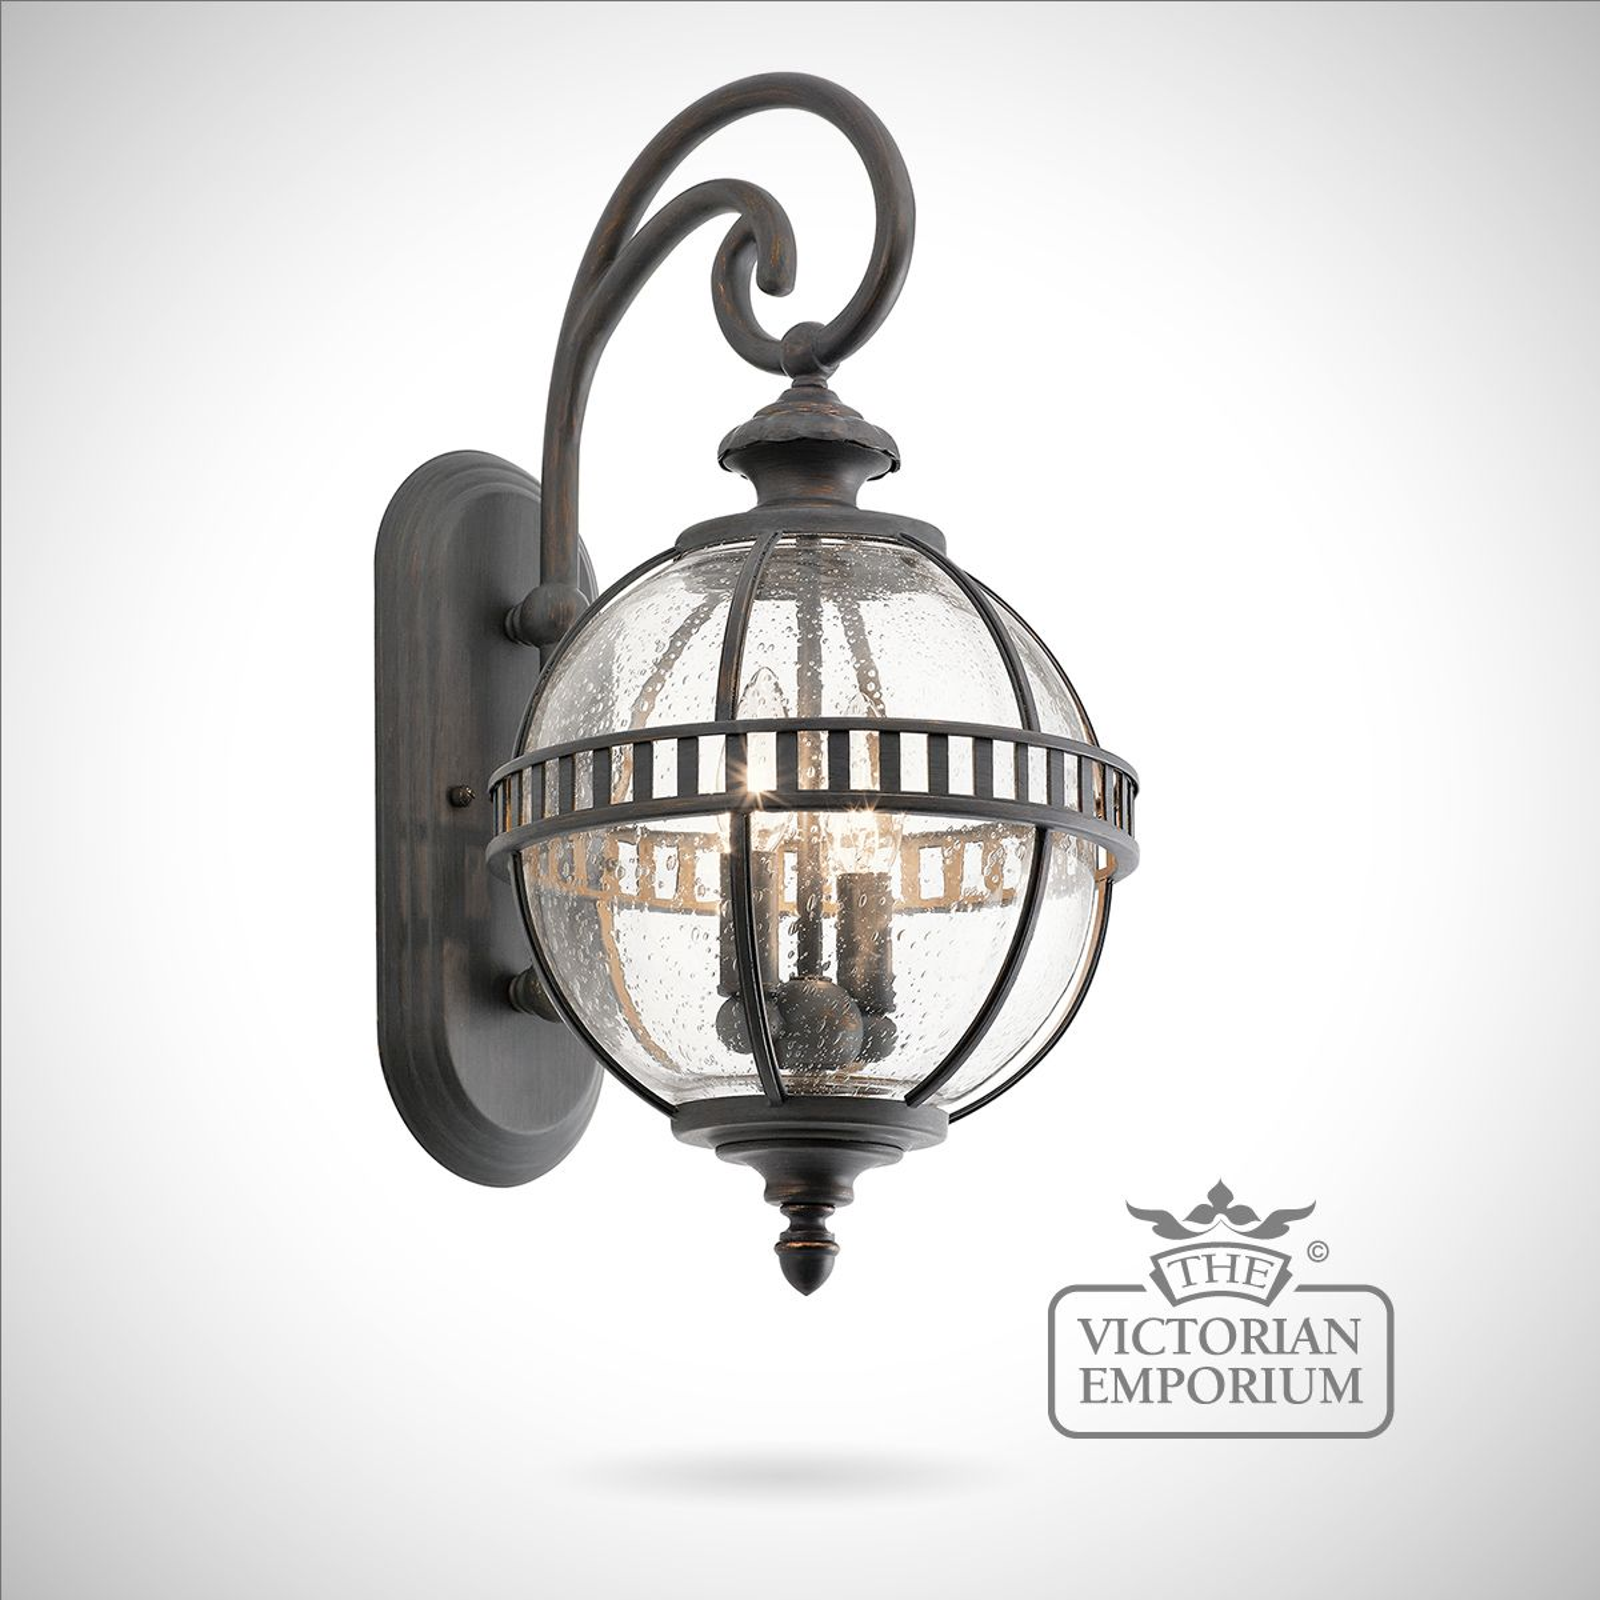 Hallaron small wall light | Outdoor Wall Lights on Small Wall Sconce Light id=53737